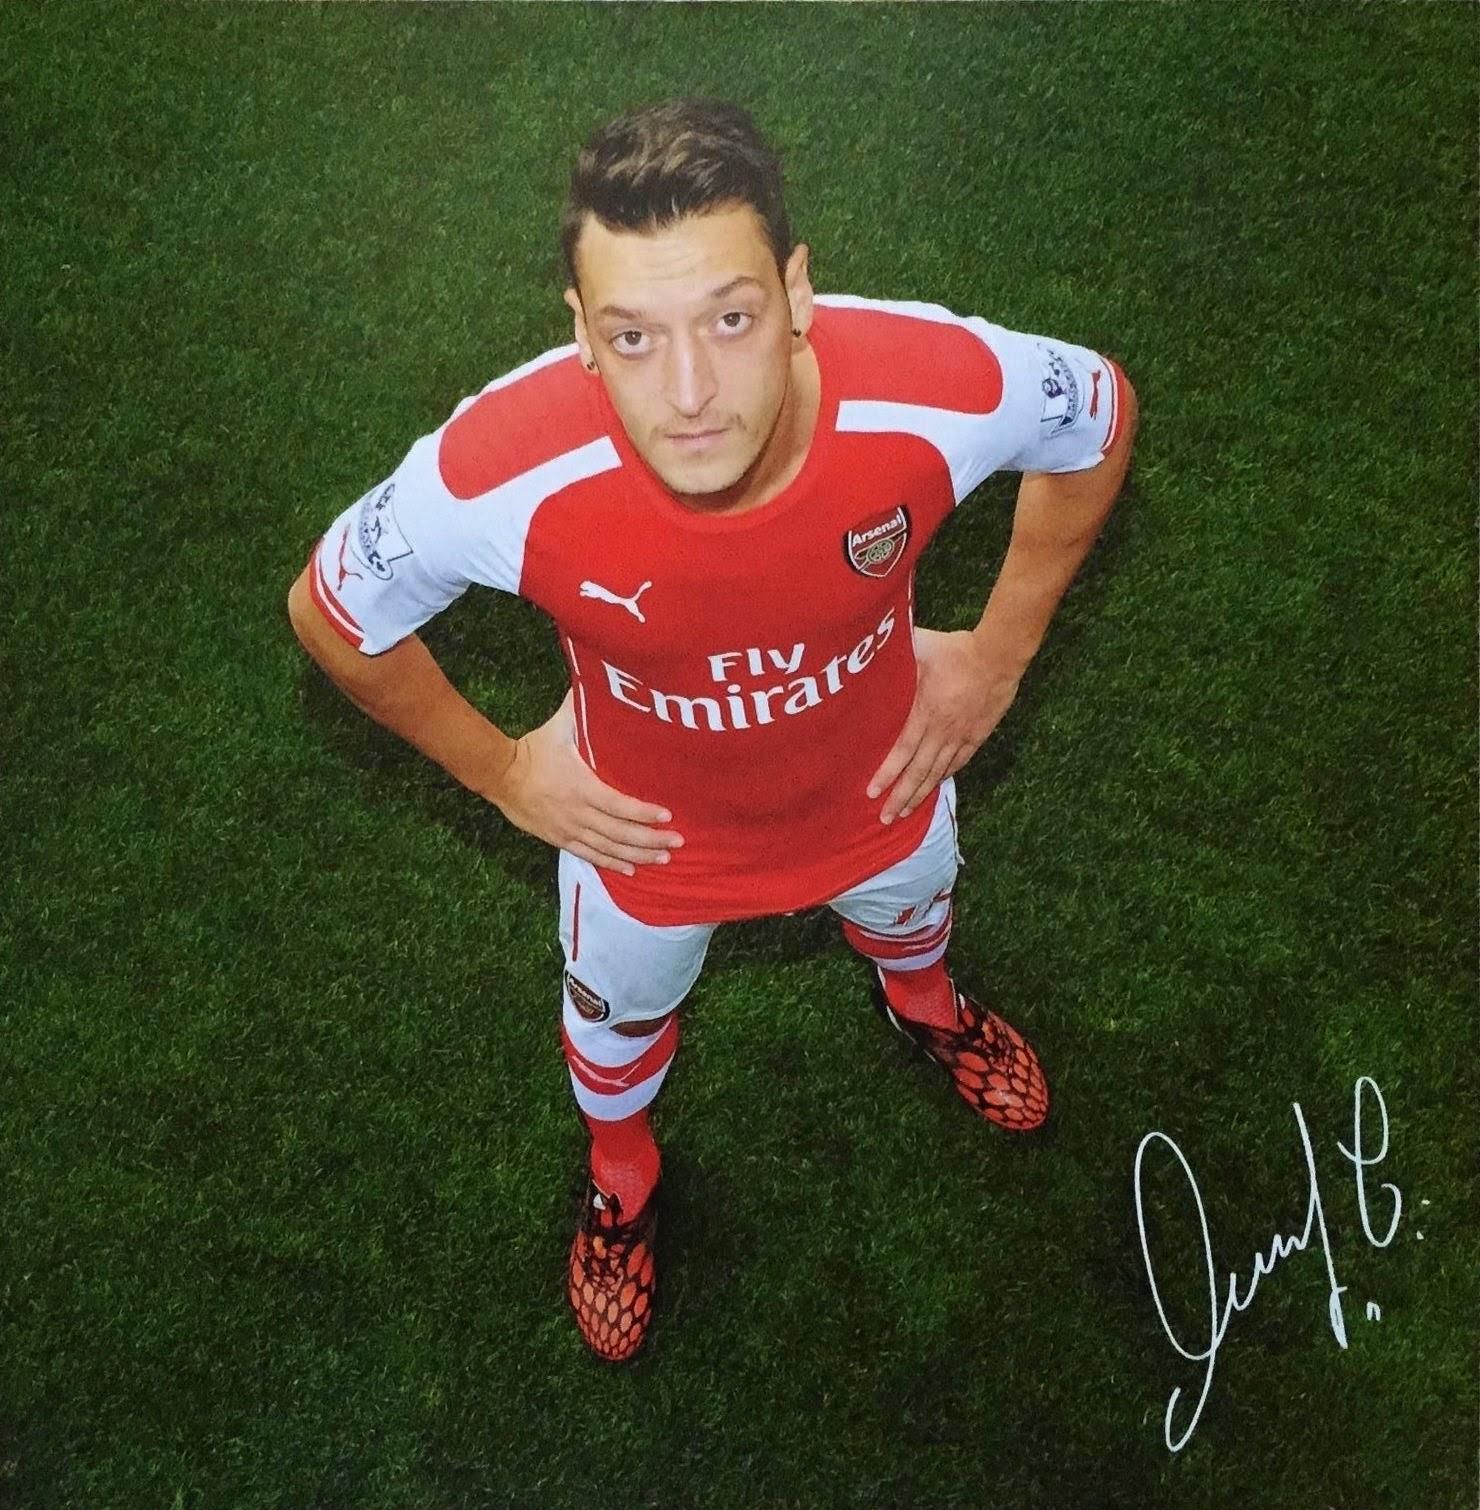 ... Info Exchange: Arsenal F.C. - Arsenal Player Cards (2014-15